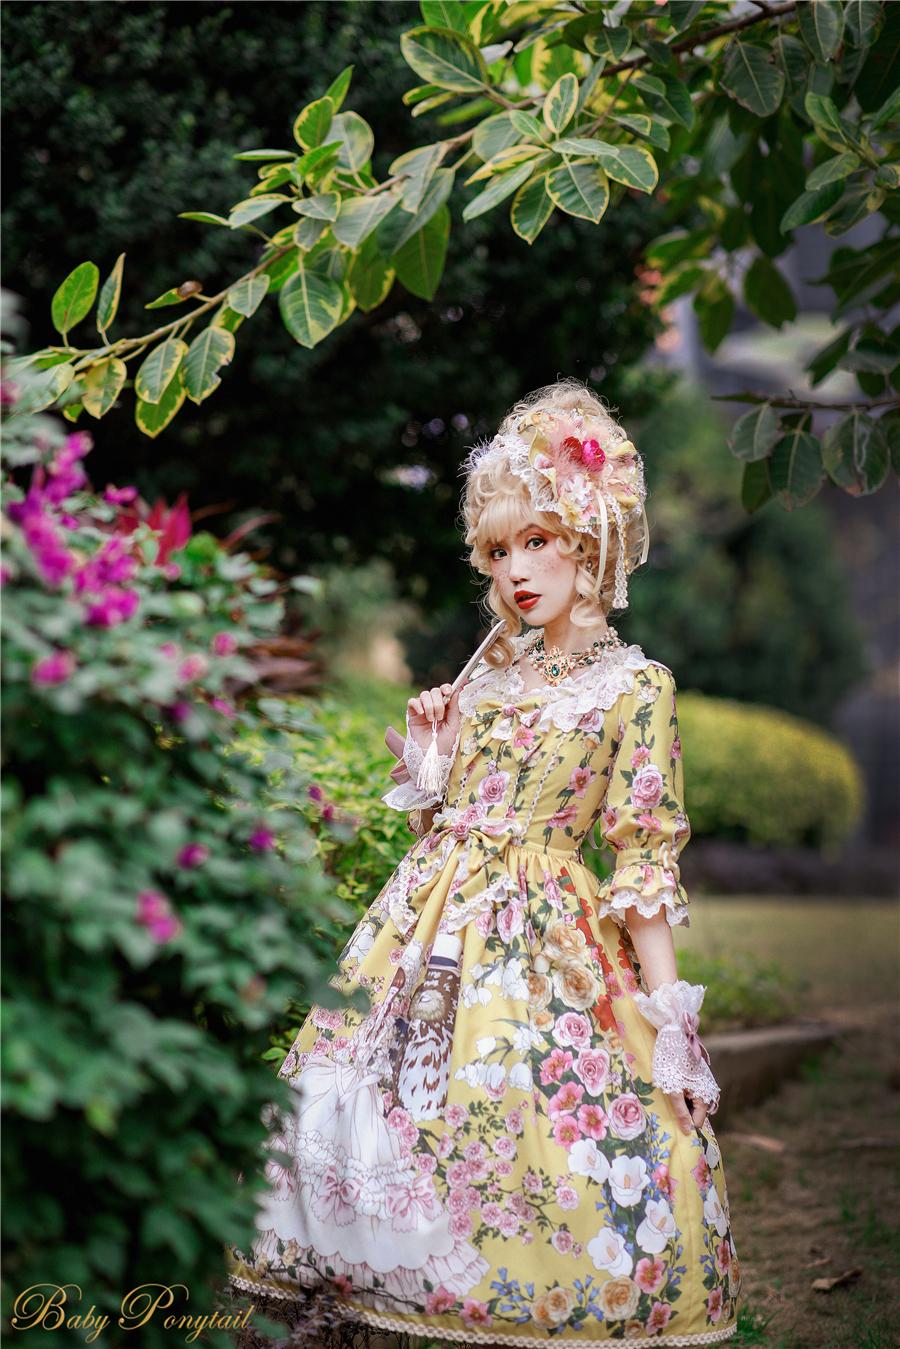 Baby Ponytail_Model Photo_Polly's Garden of Dreams_OP Yellow_Kaka_02.jpg